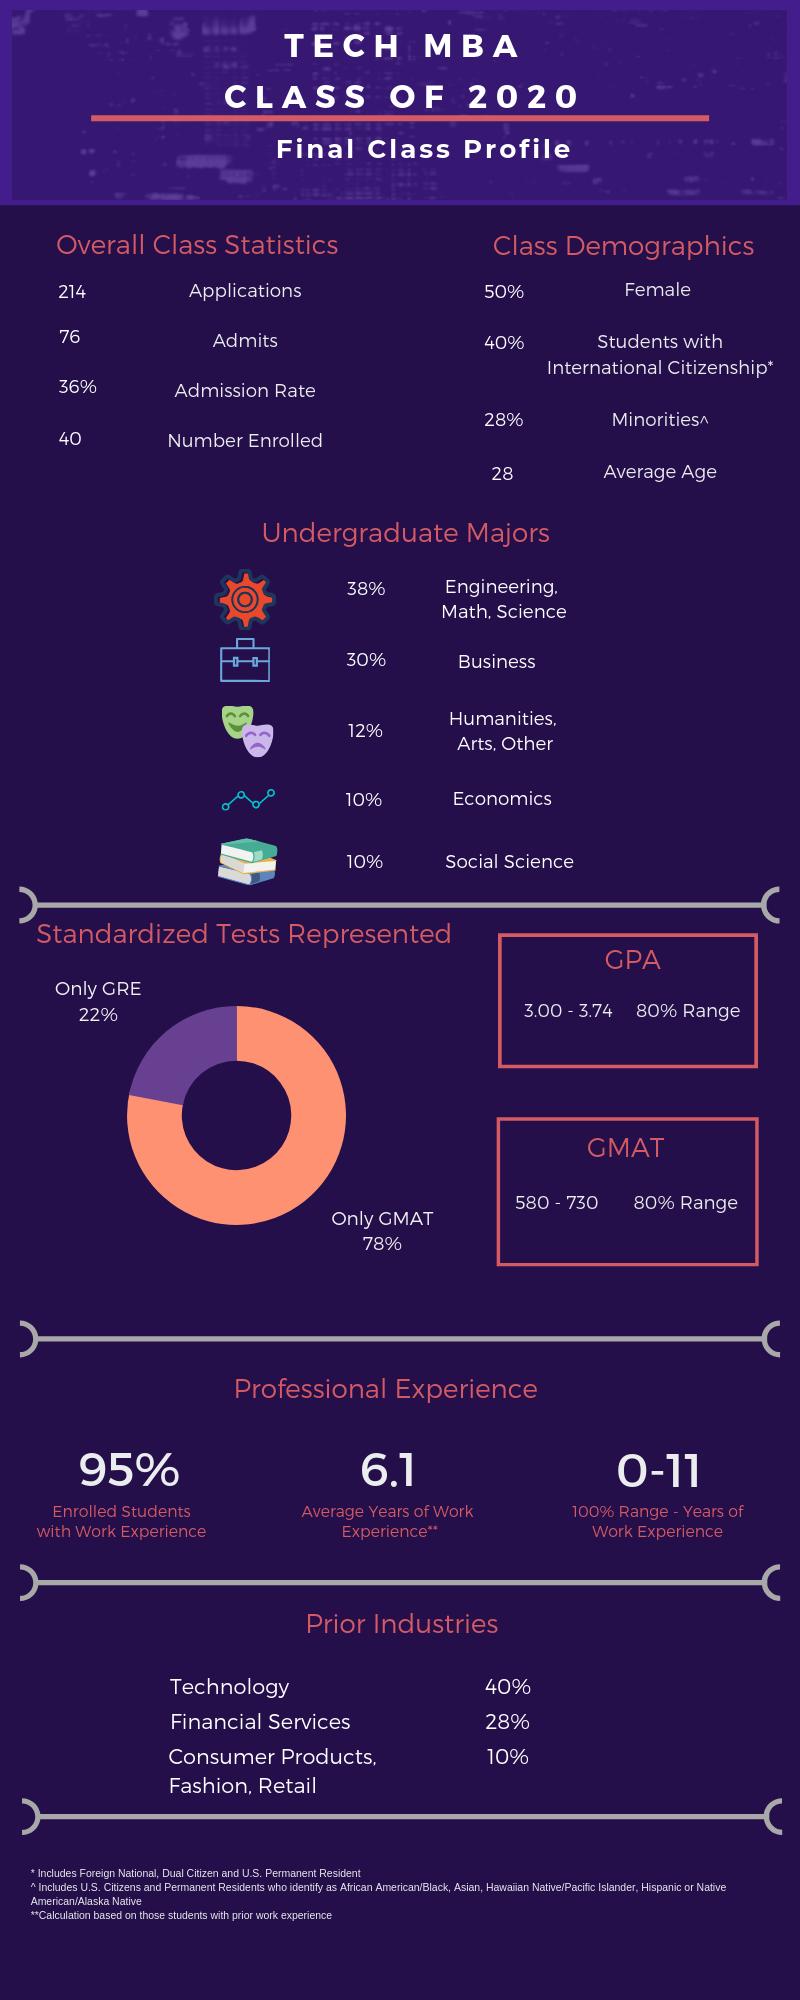 Tech MBA Class of 2020 profile